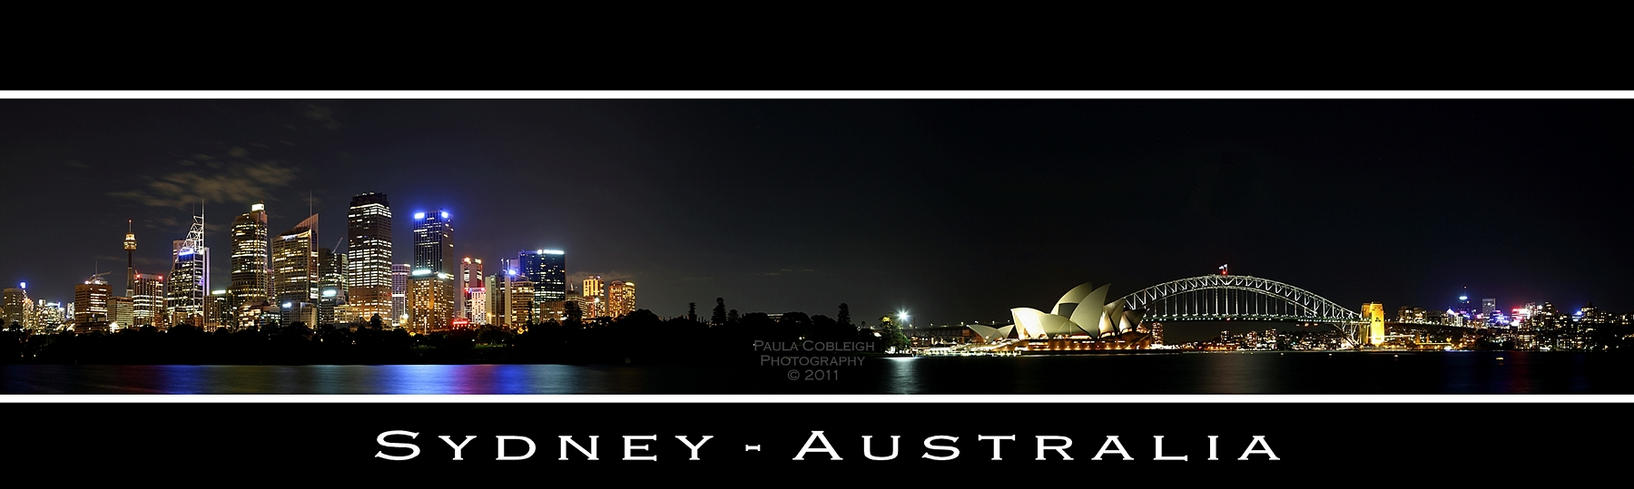 Sydney Skyline by La-Vita-a-Bella